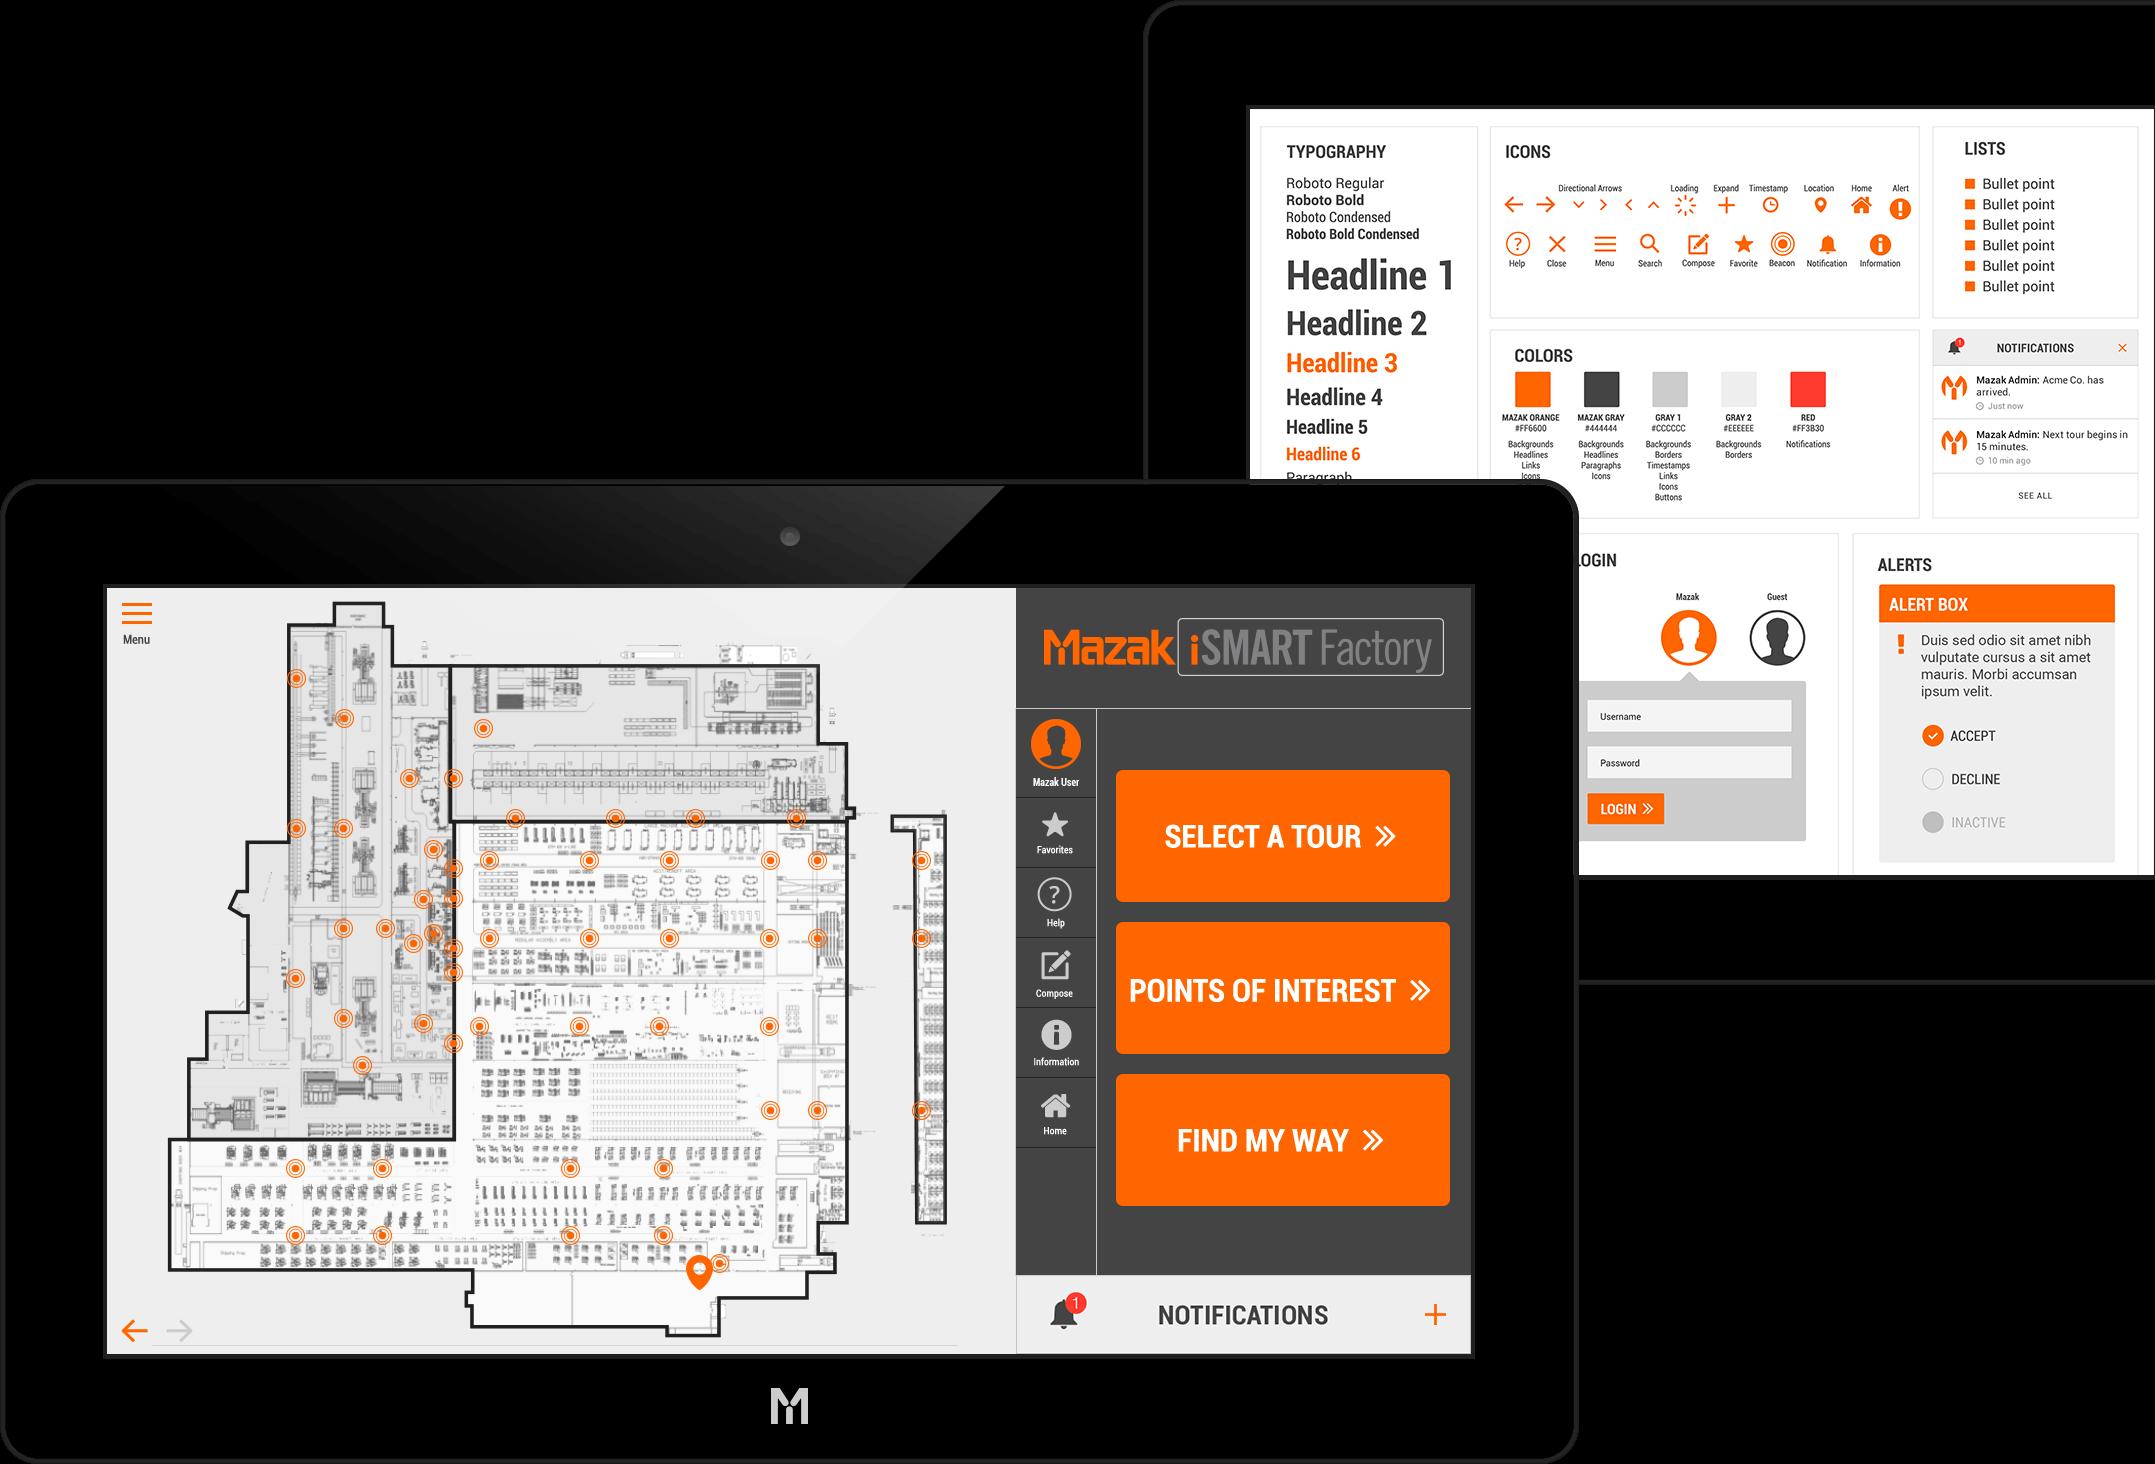 mazak-ismart-factory-app-mockup